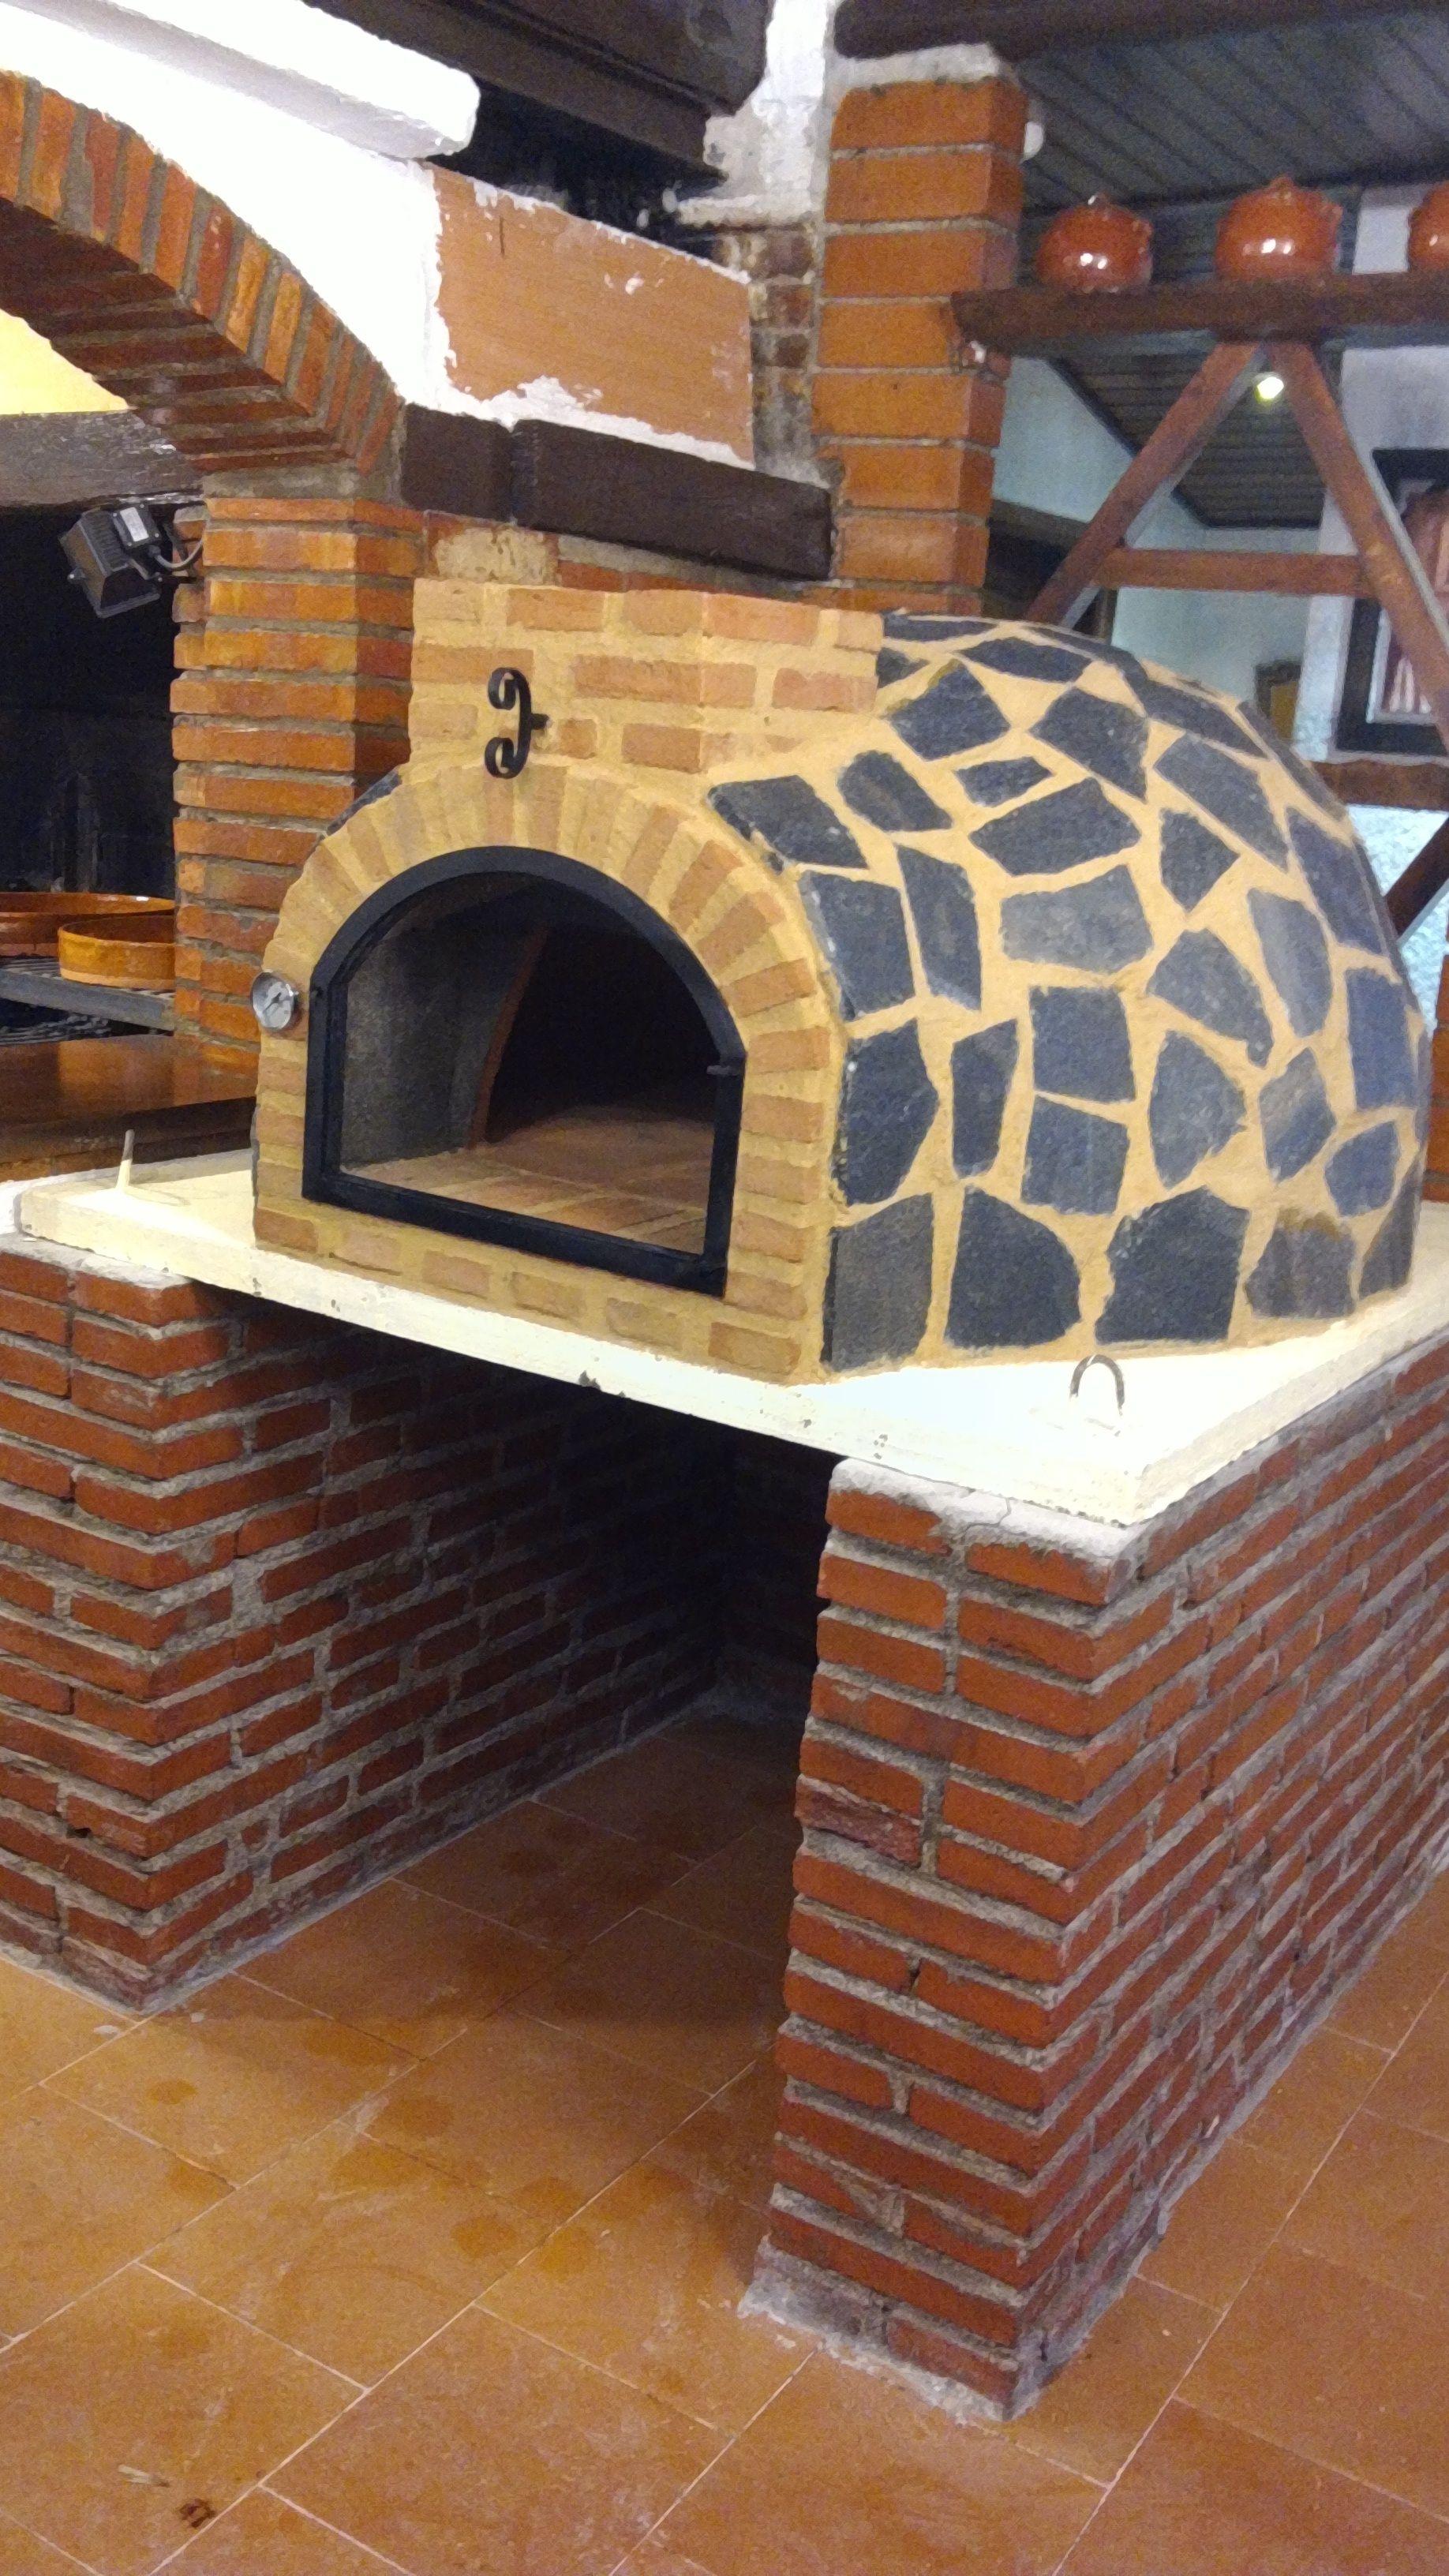 Montaje Horno De Barro Acabado En Piedra Natural En 2020 Con Imagenes Hornos Para Pizzas Diseno De Exterior De Cocina Hornos De Ladrillo